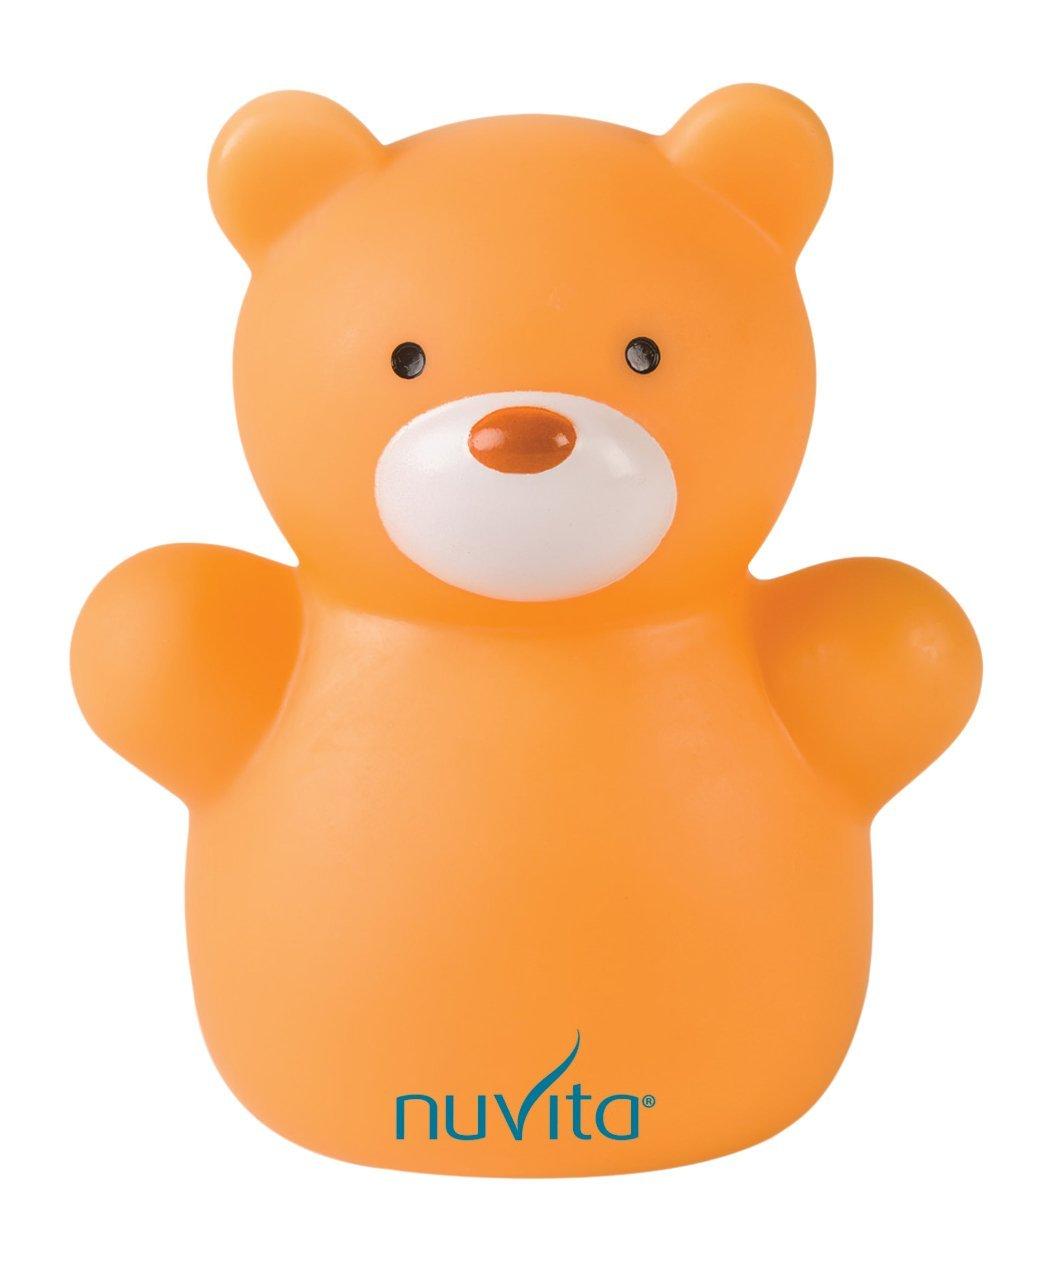 Nuvita 6601 Veilleuse Forme Ourson Taille S Orange NU-BDNL0001